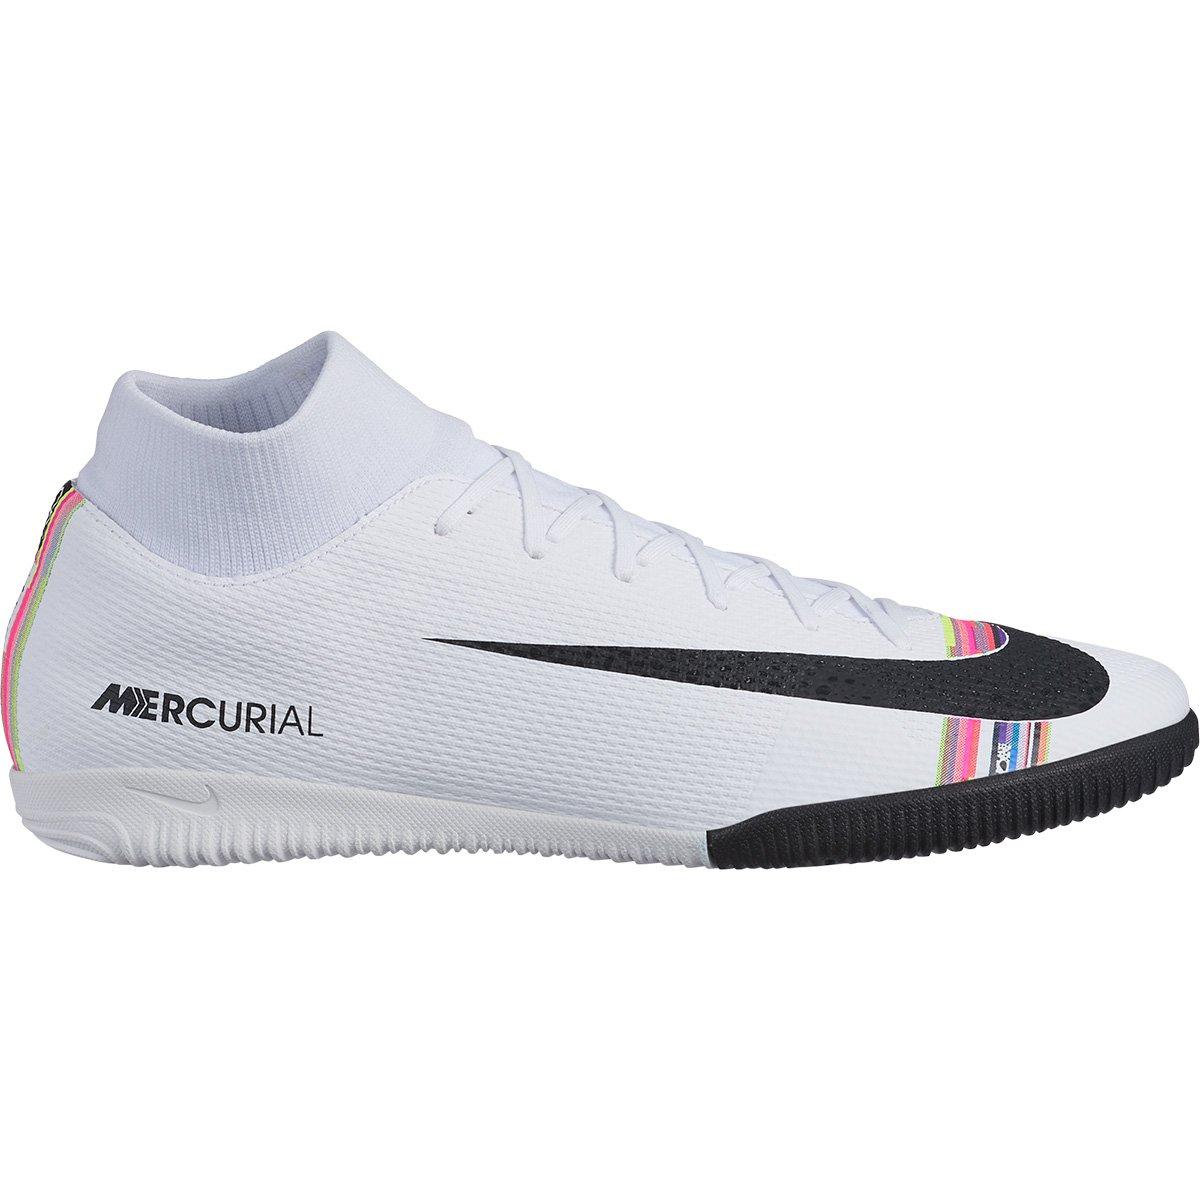 Chuteira Futsal Nike Mercurial Superfly 6 Academy CR7 IC - Vermelho e Preto